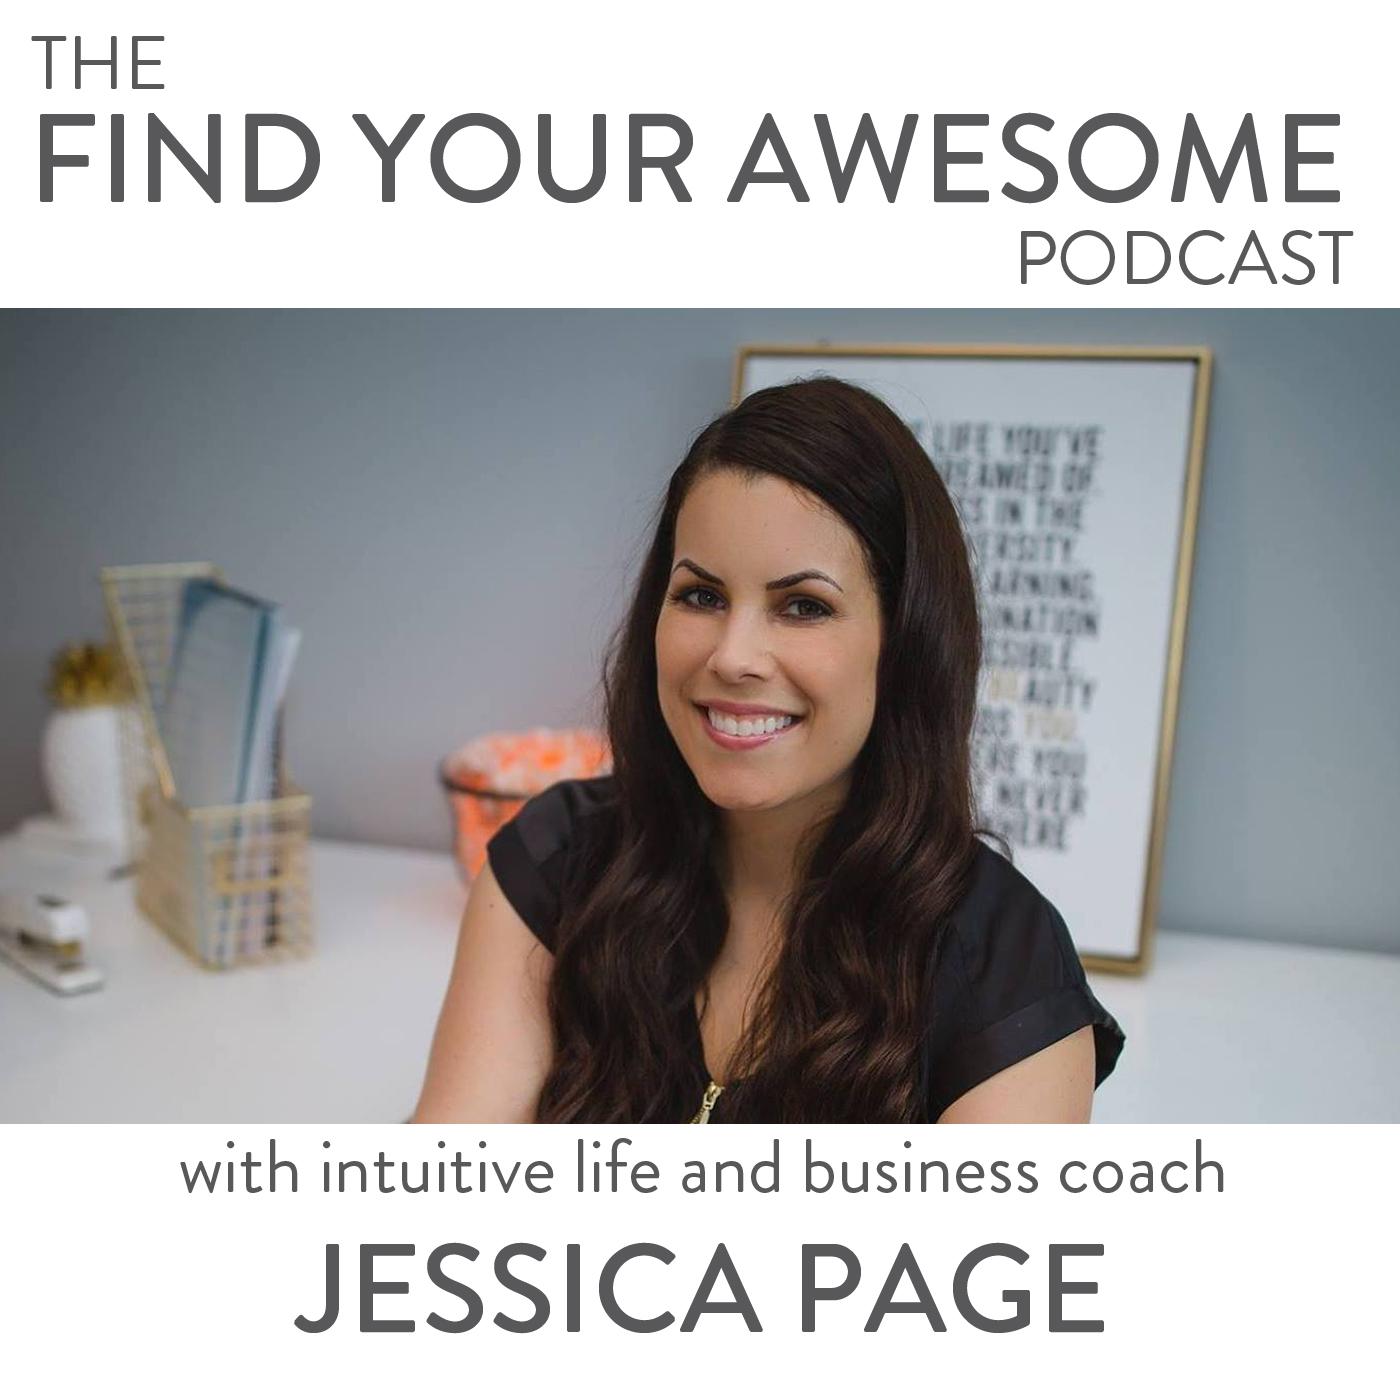 JessicaPage_podcast_coverart.jpg